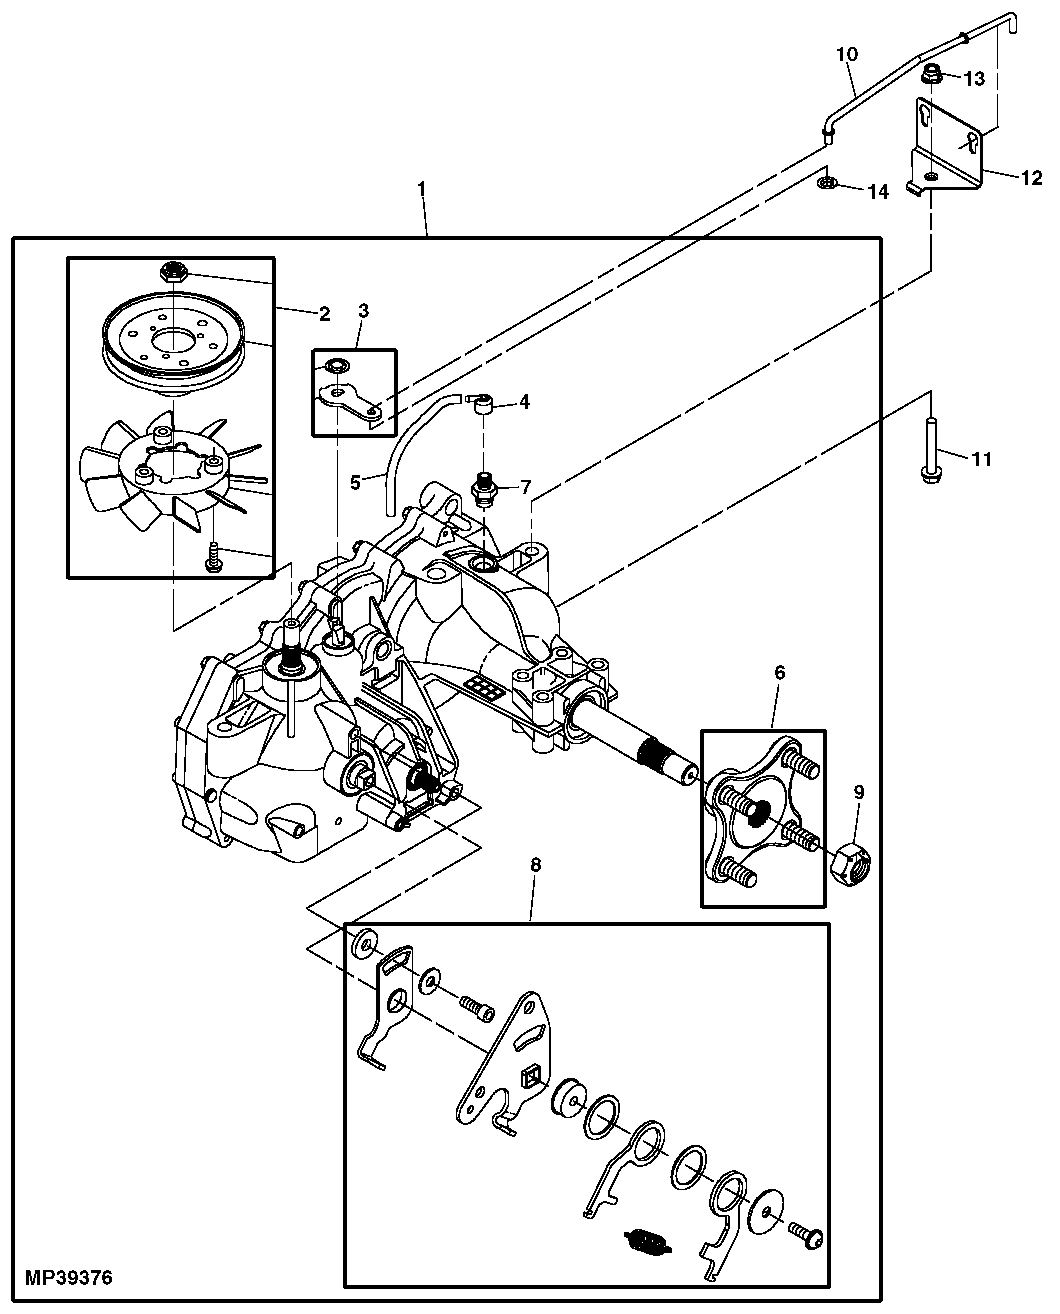 john deere 445 wiring diagram 2003 harley fatboy z445 l120